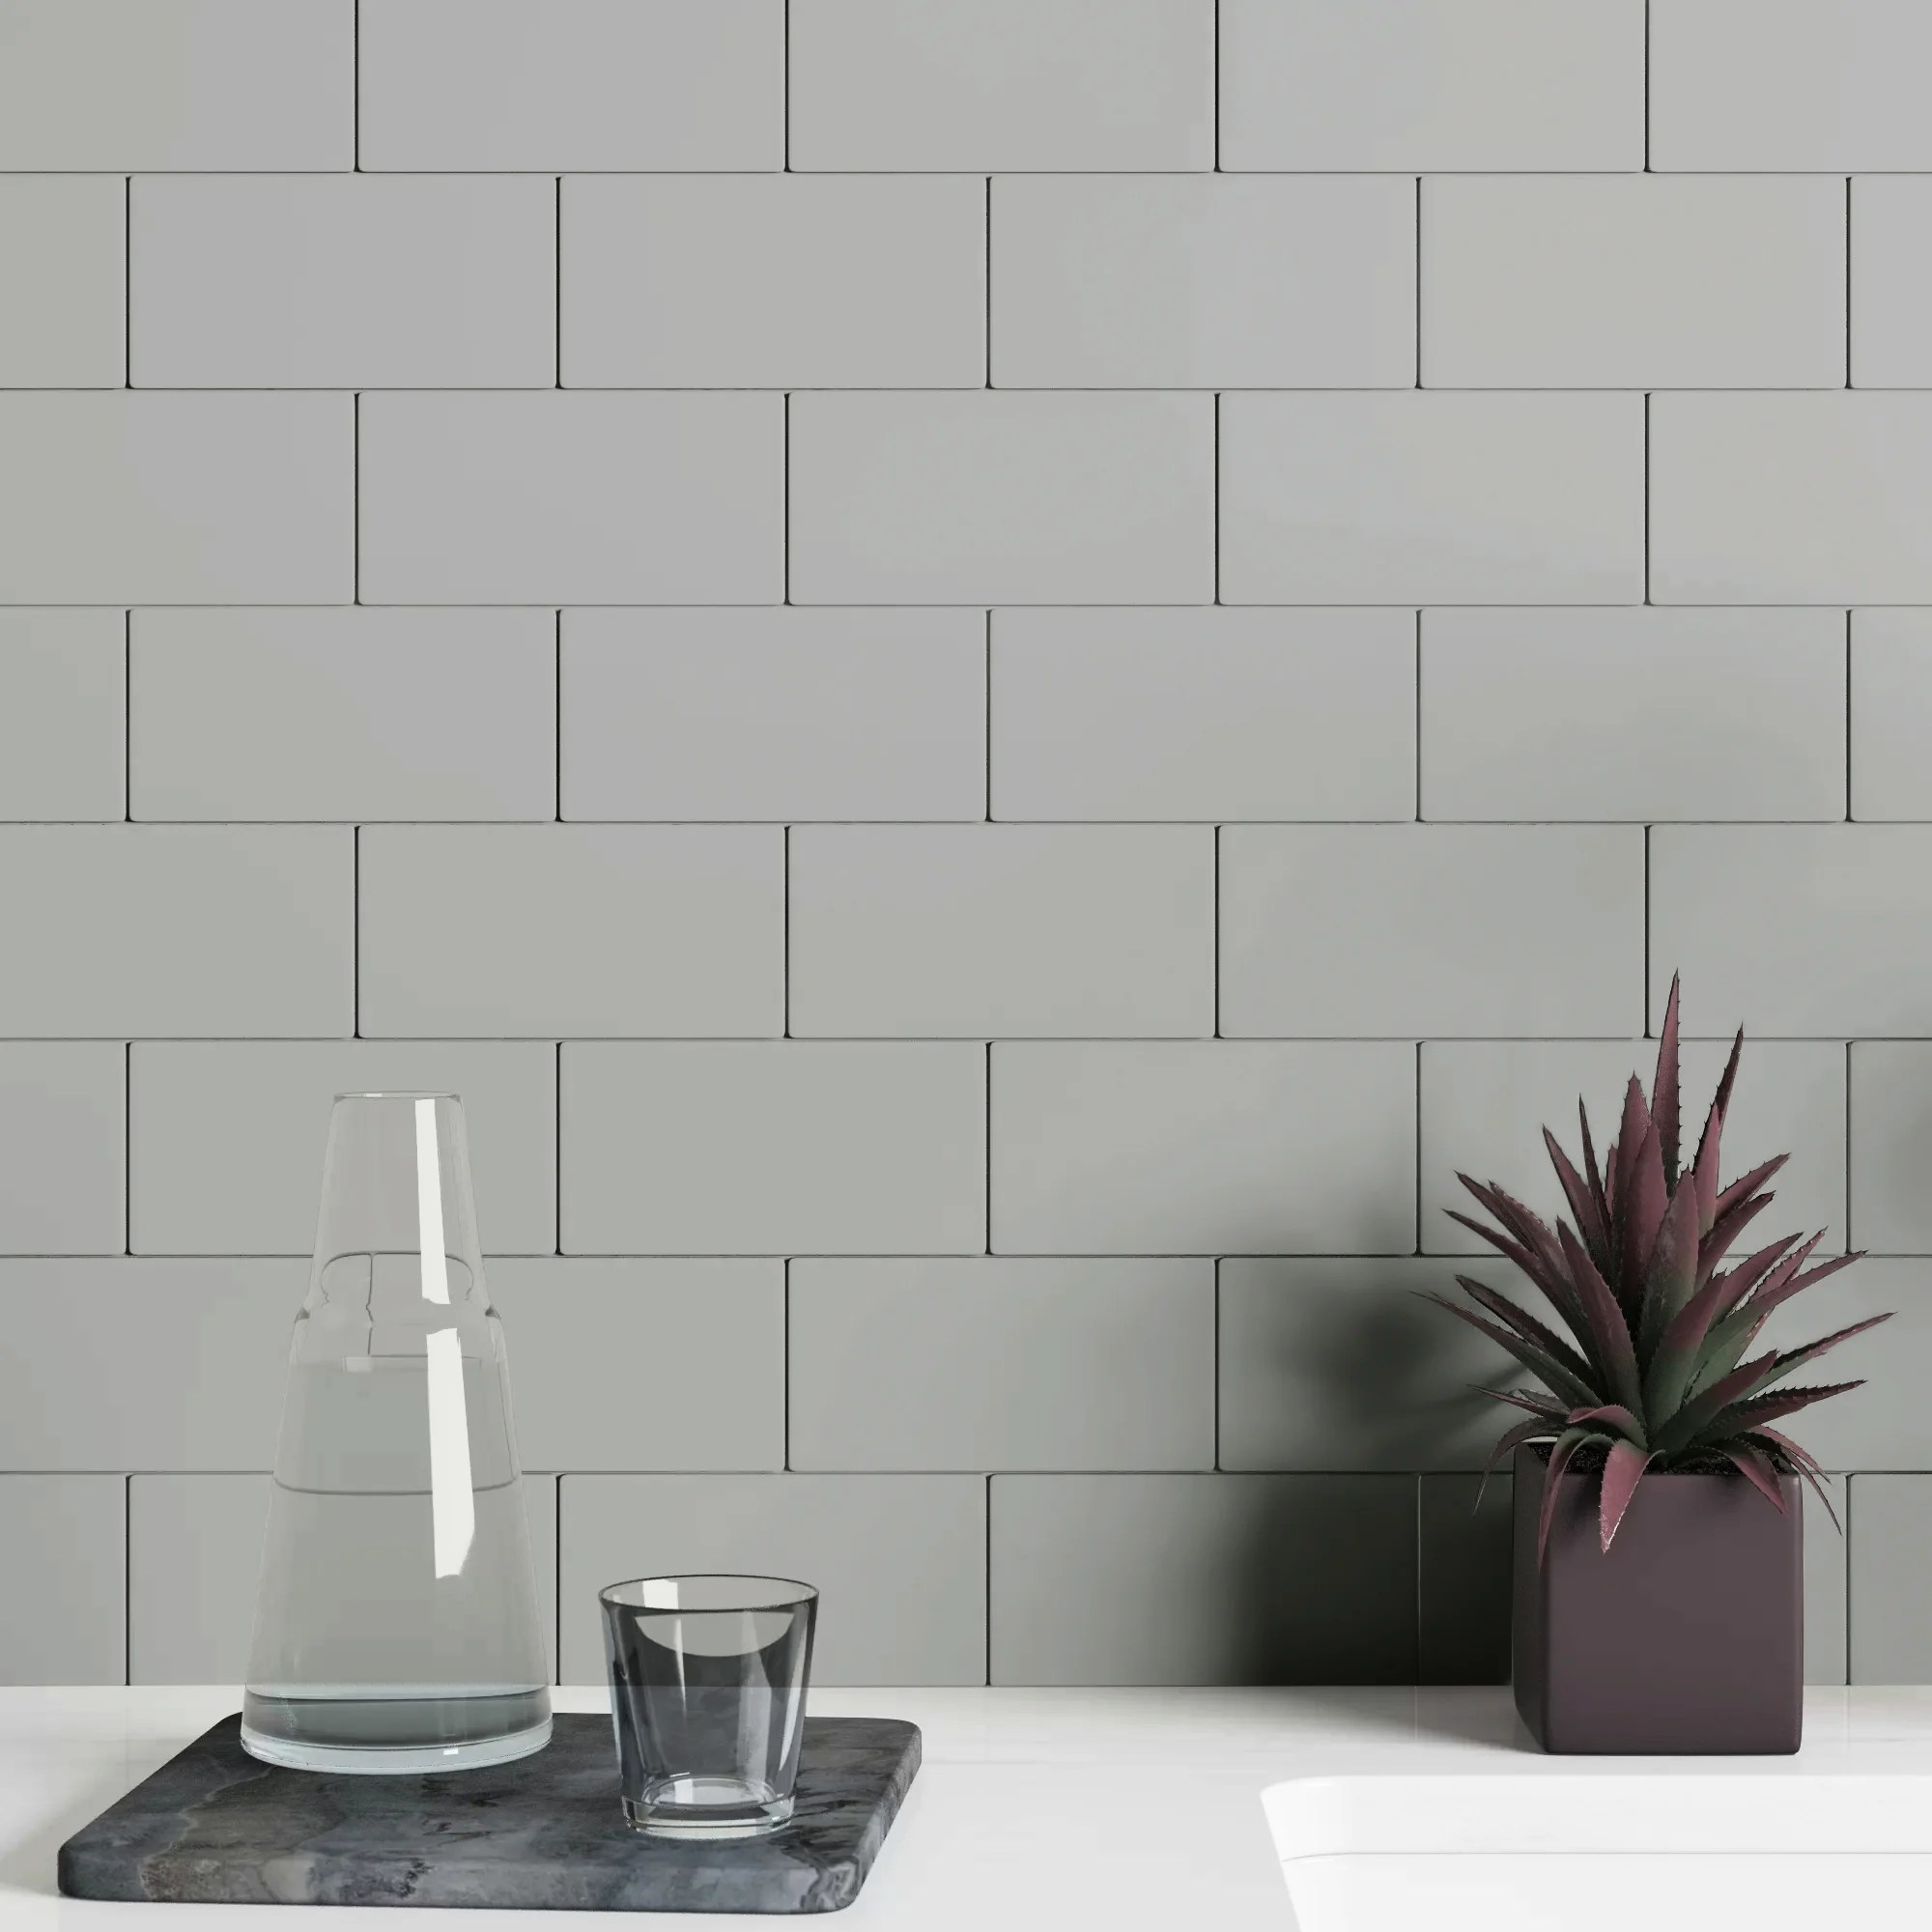 gladwell 3 x 6 ceramic subway tile